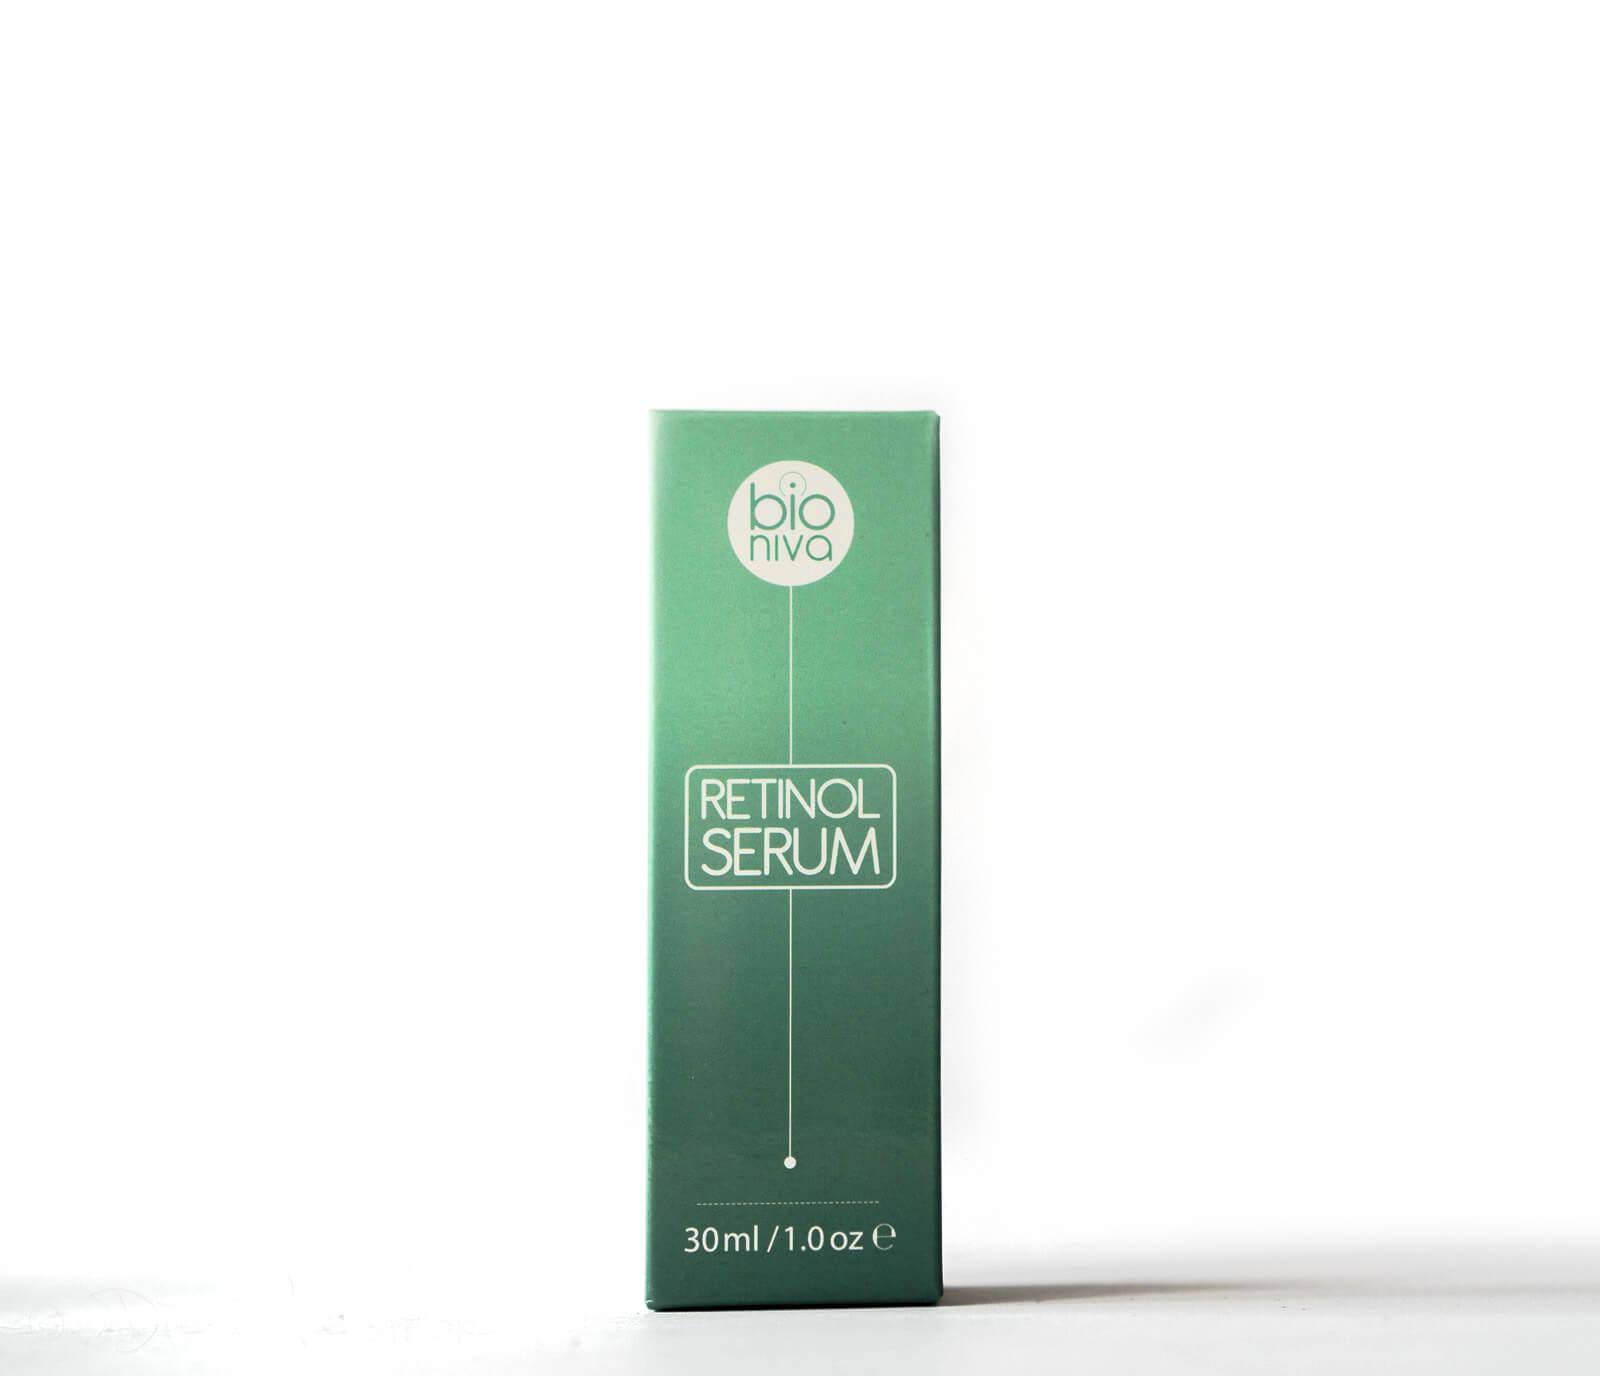 Retinol Serum von Bioniva